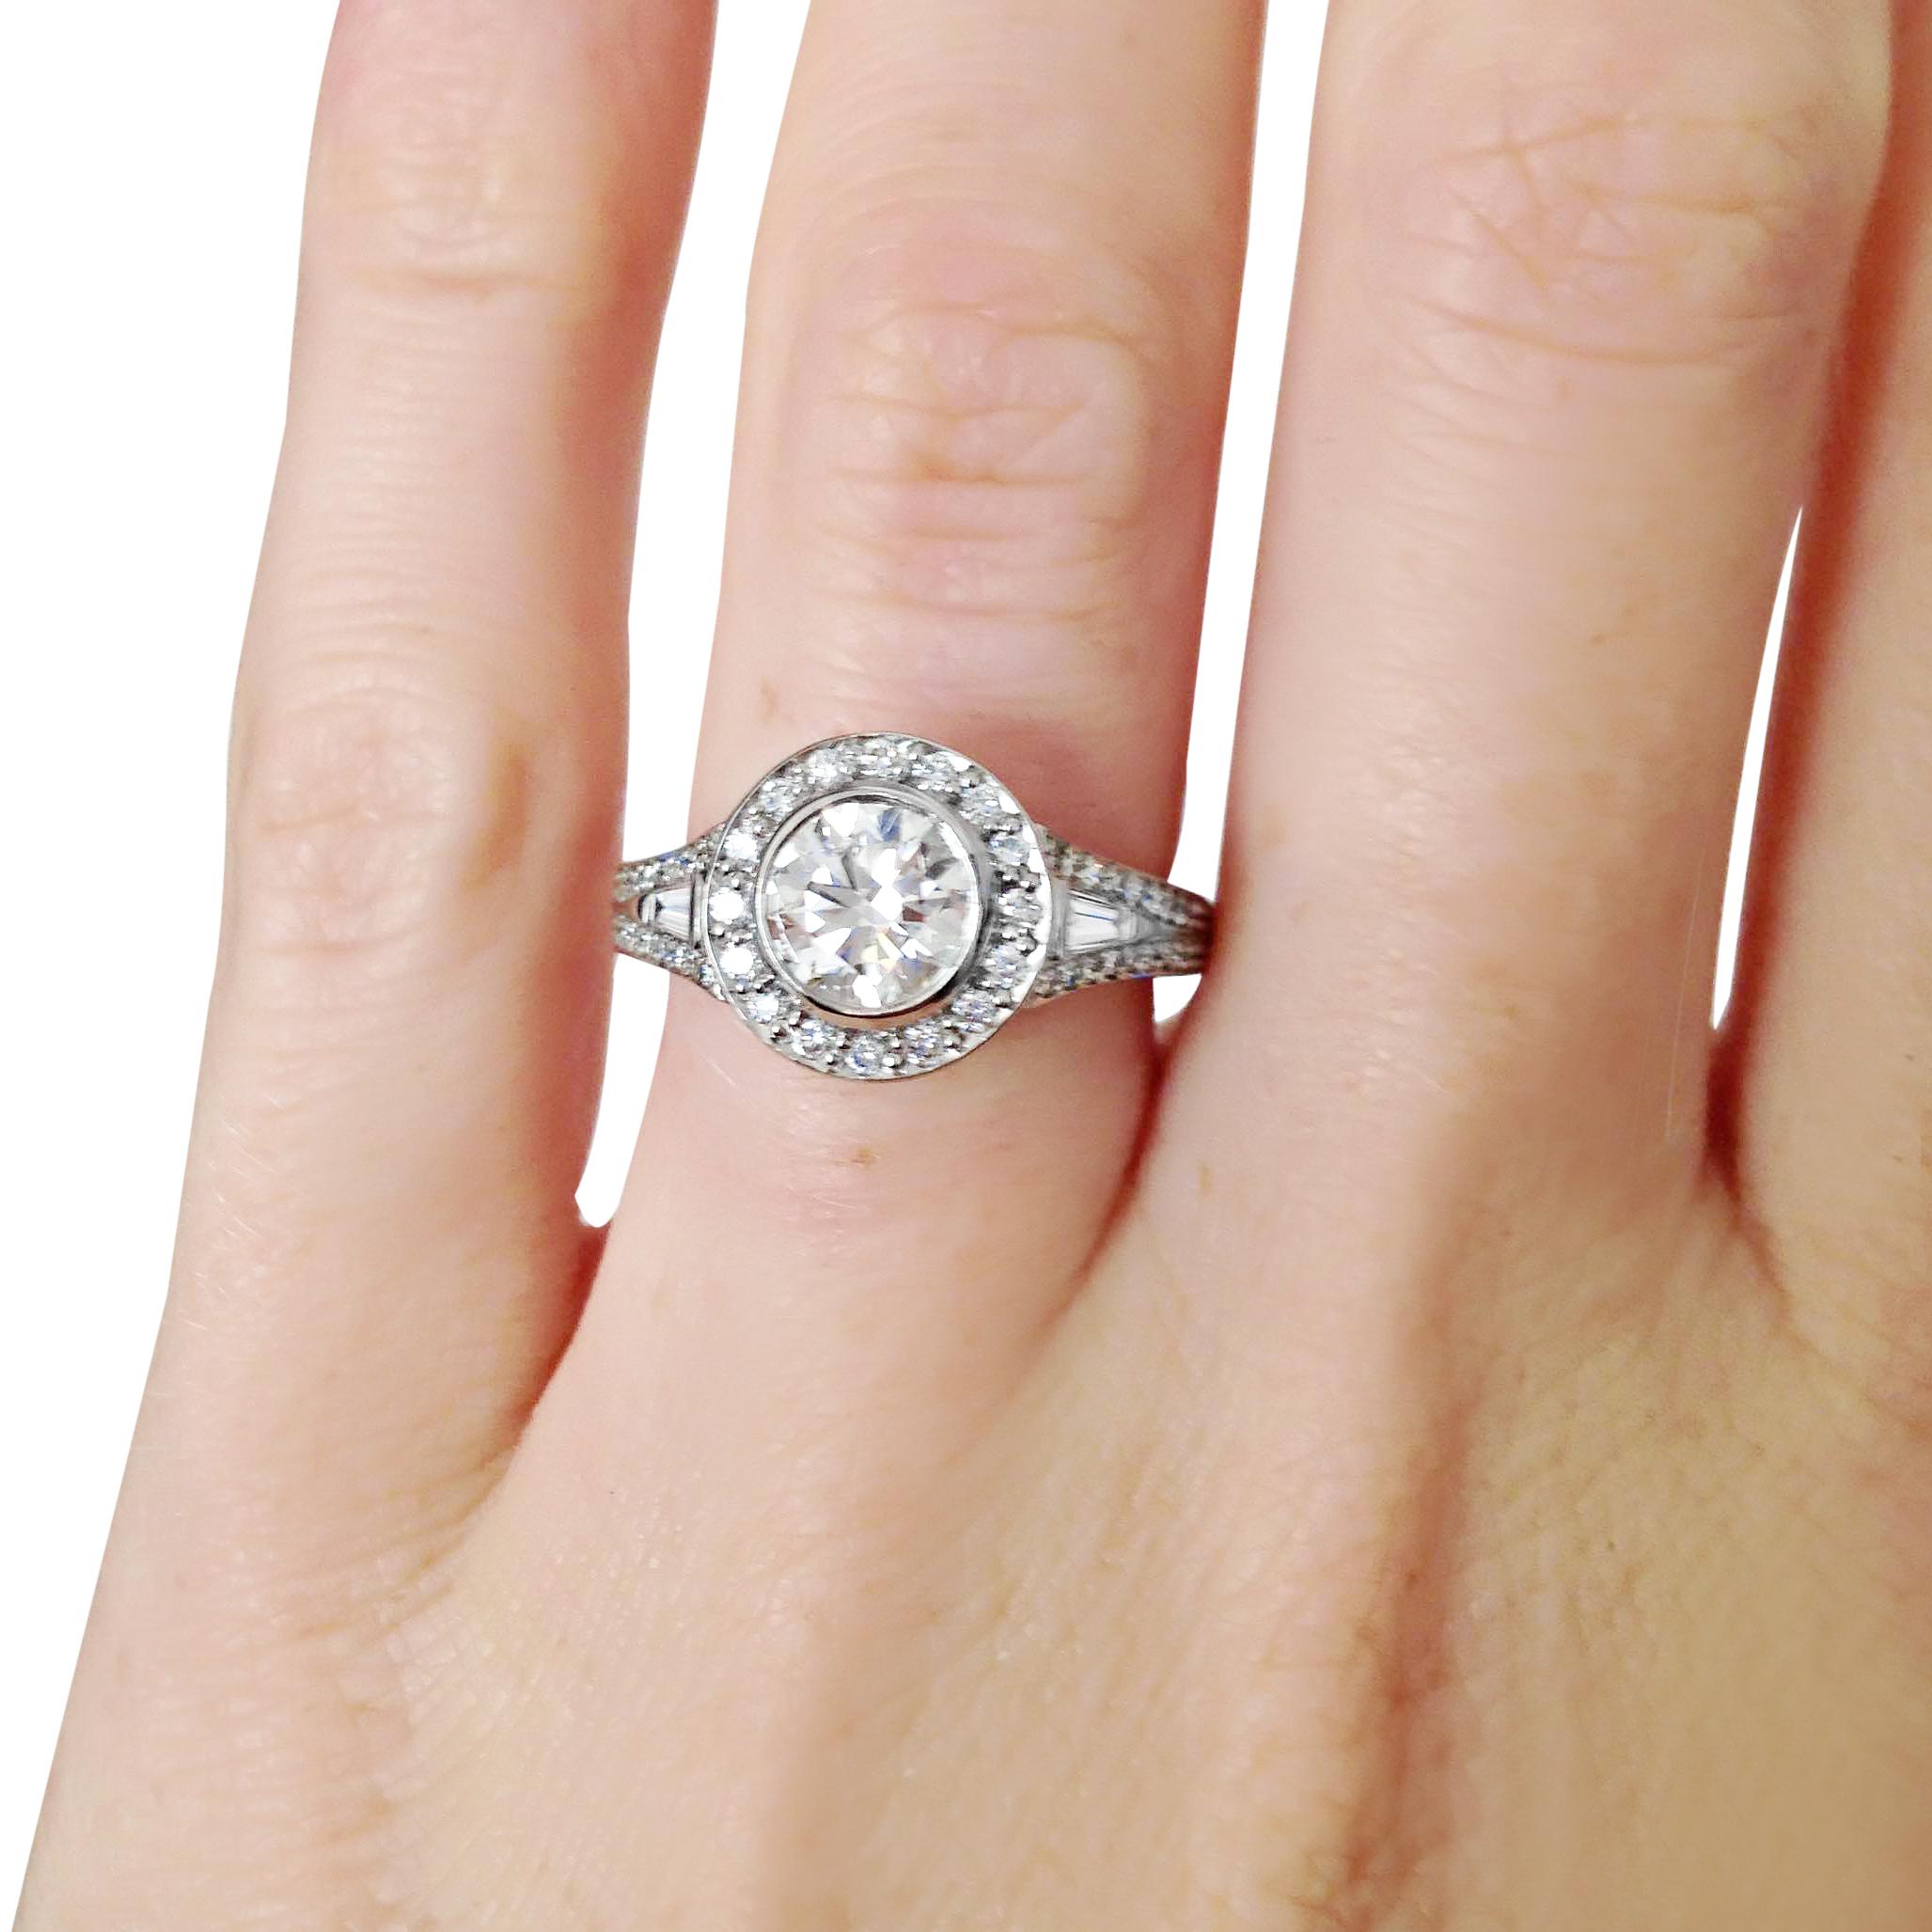 diamond-cluster-ring-mounted-in-platinum.jpg